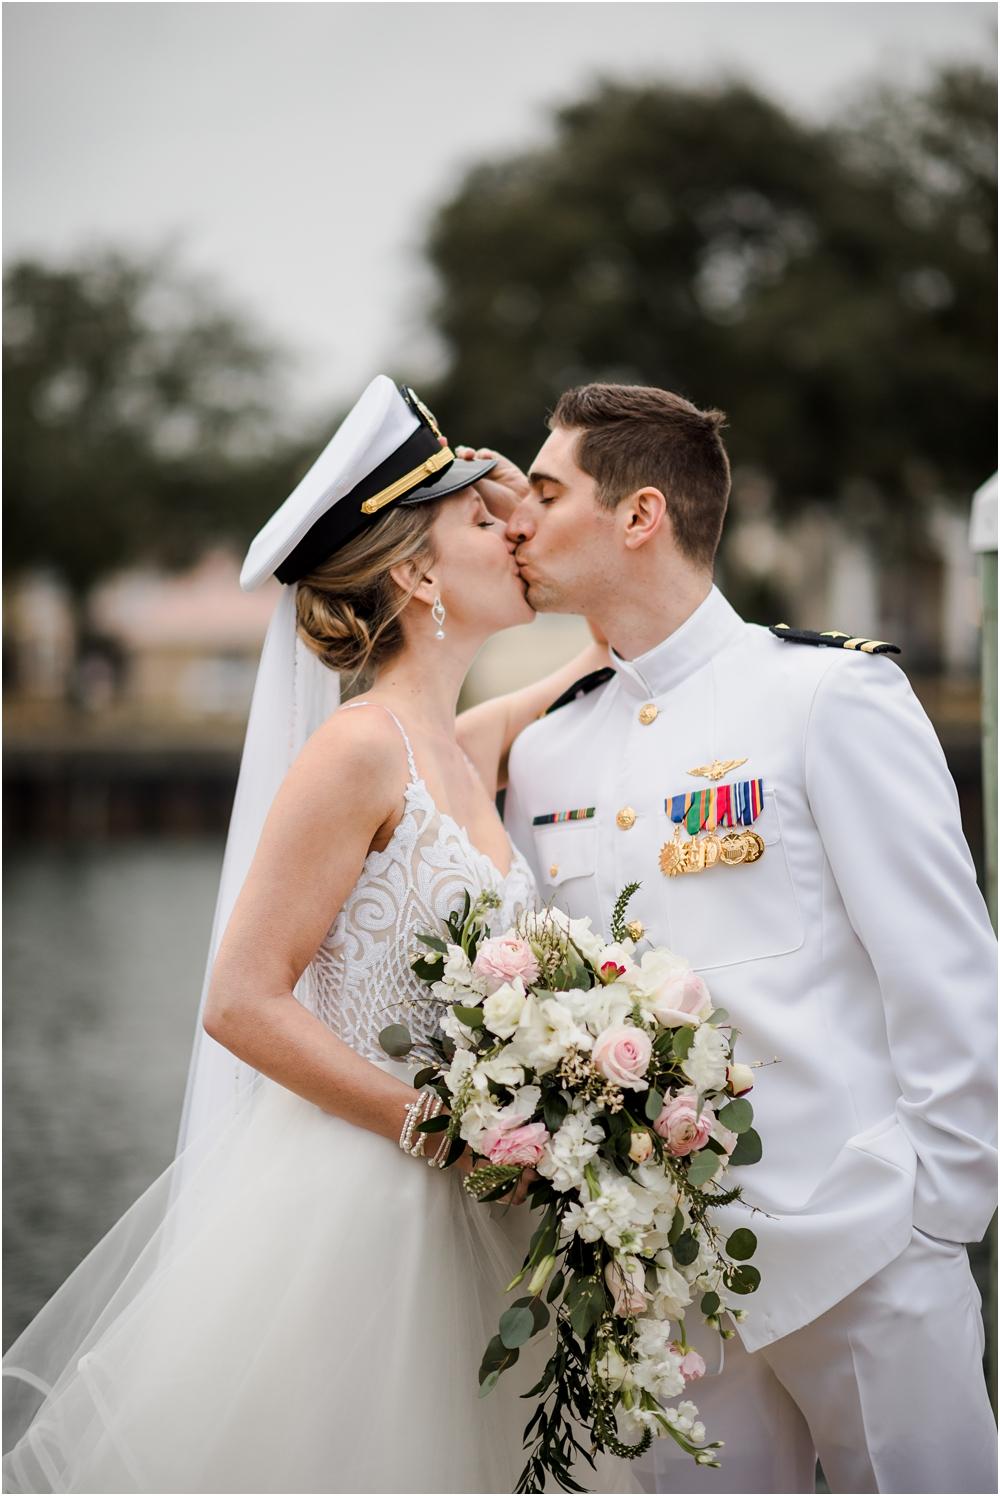 oconnor-pensacola-florida-wedding-photographer-kiersten-taylor-77.jpg